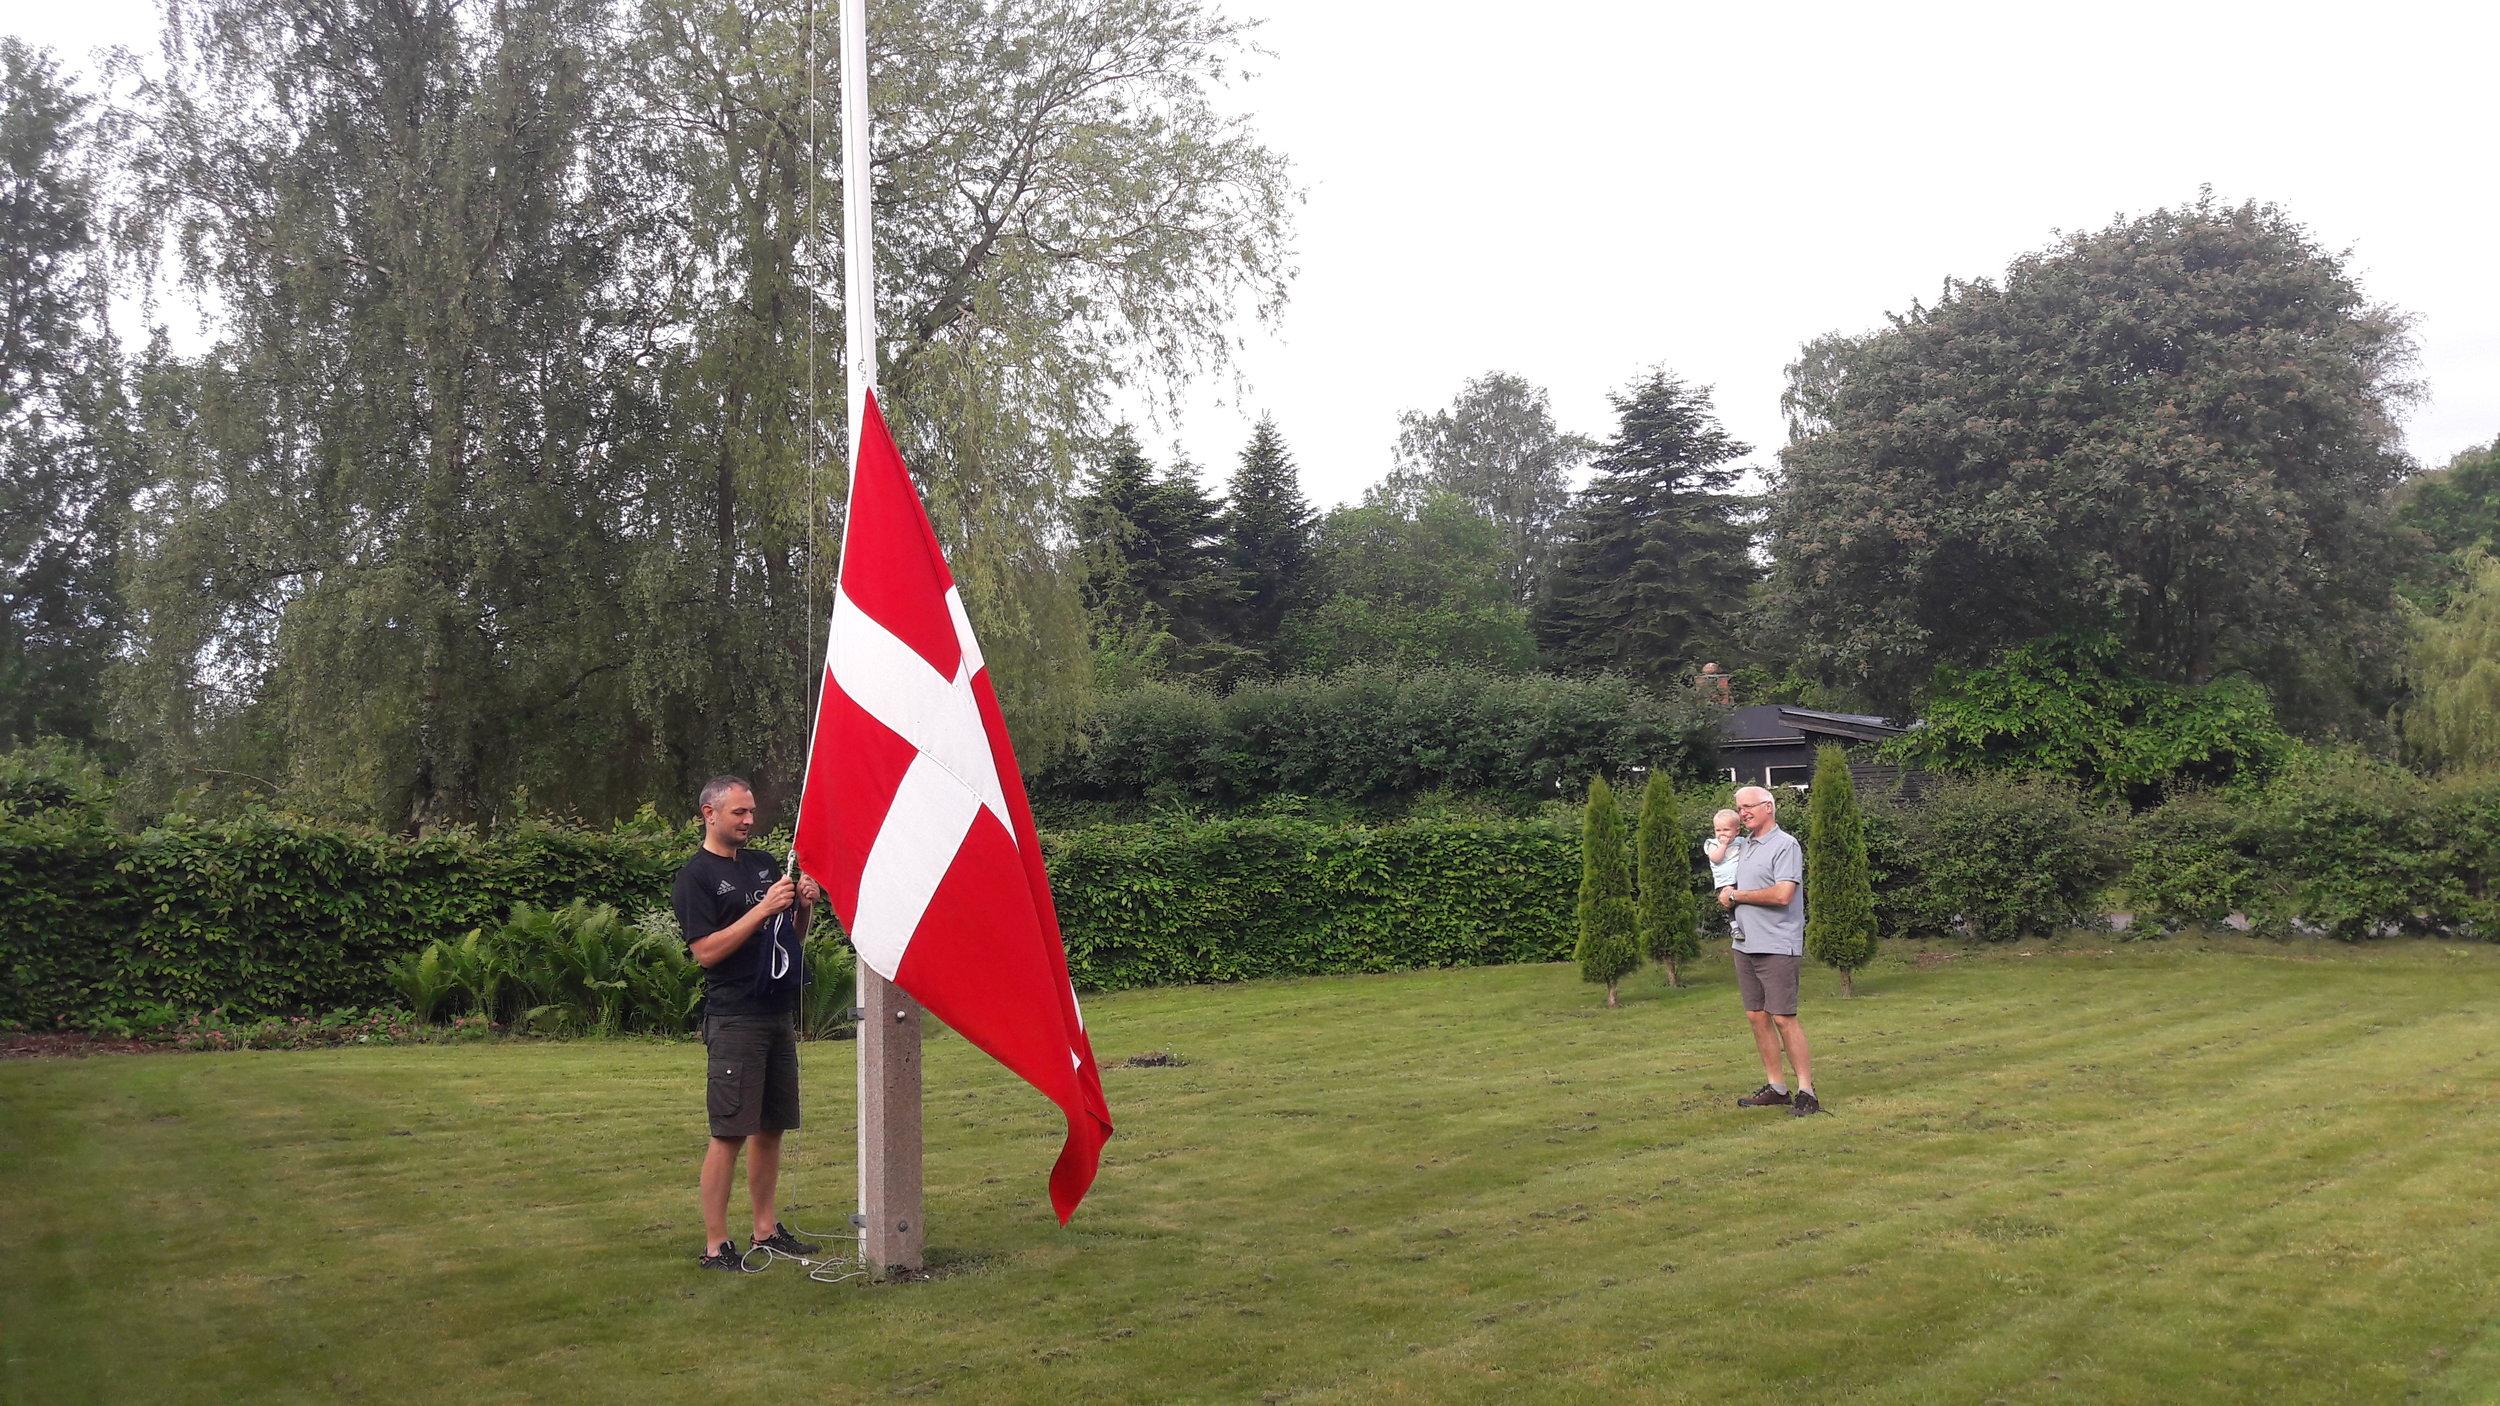 The Dane & his flag